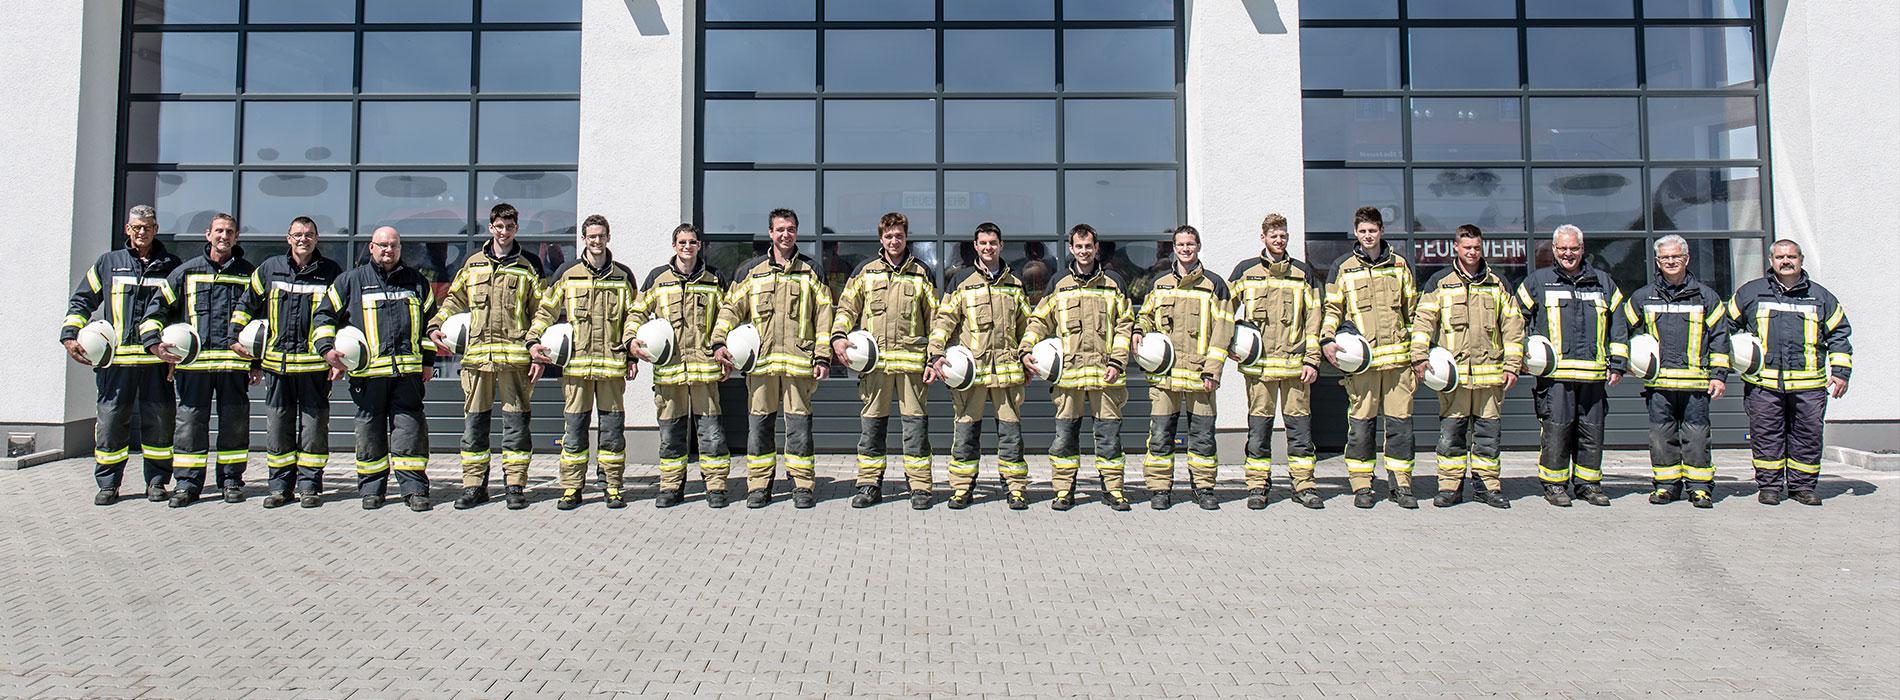 Feuerwehr-Etscheid_Mannschaft_VG-Asbach